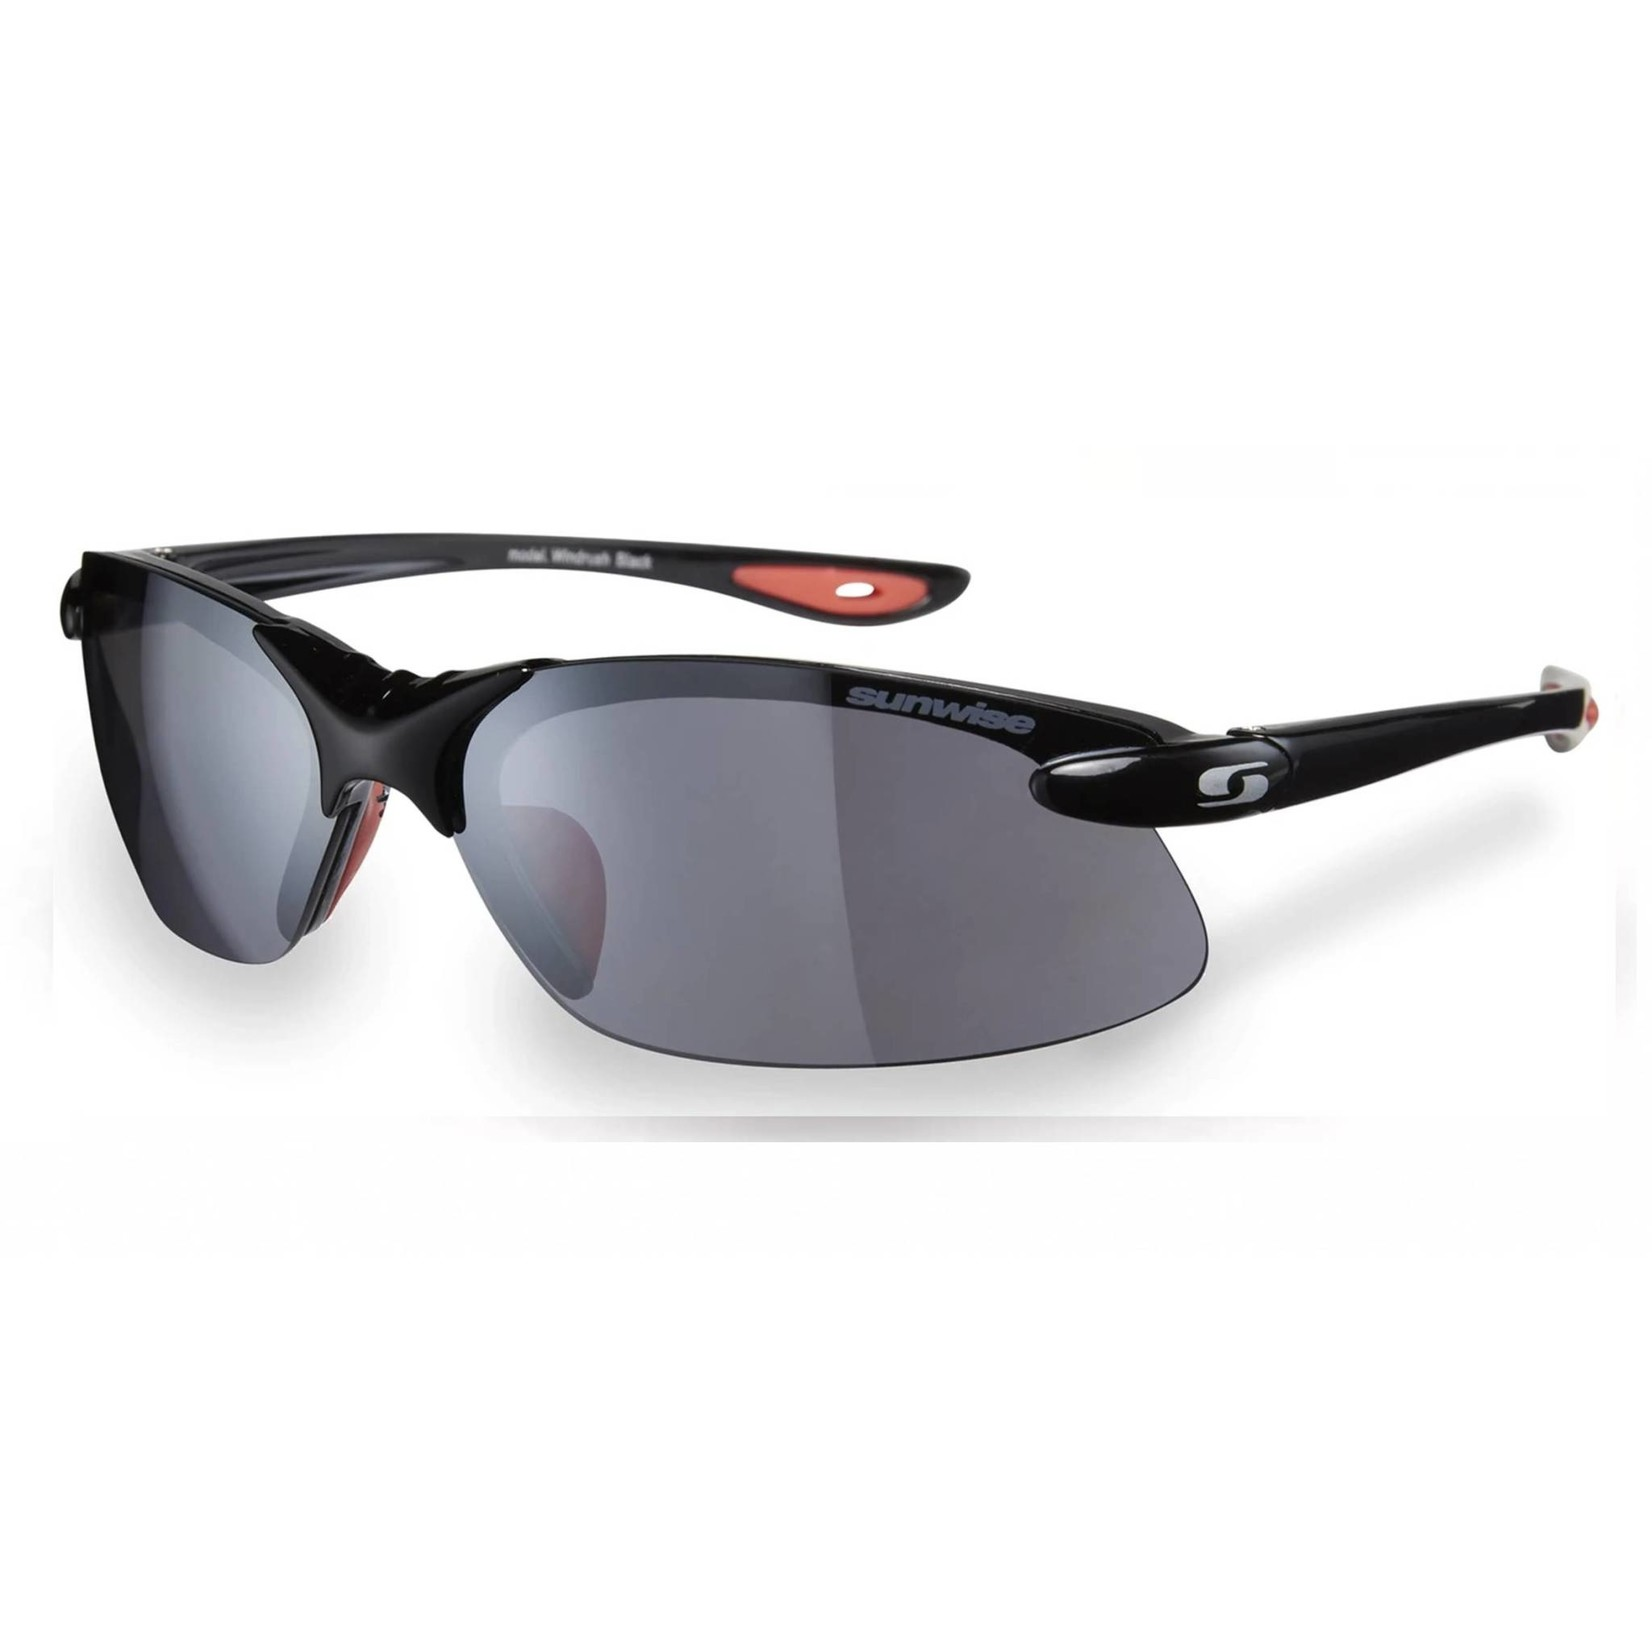 Sunwise Windrush Sunglasses Black